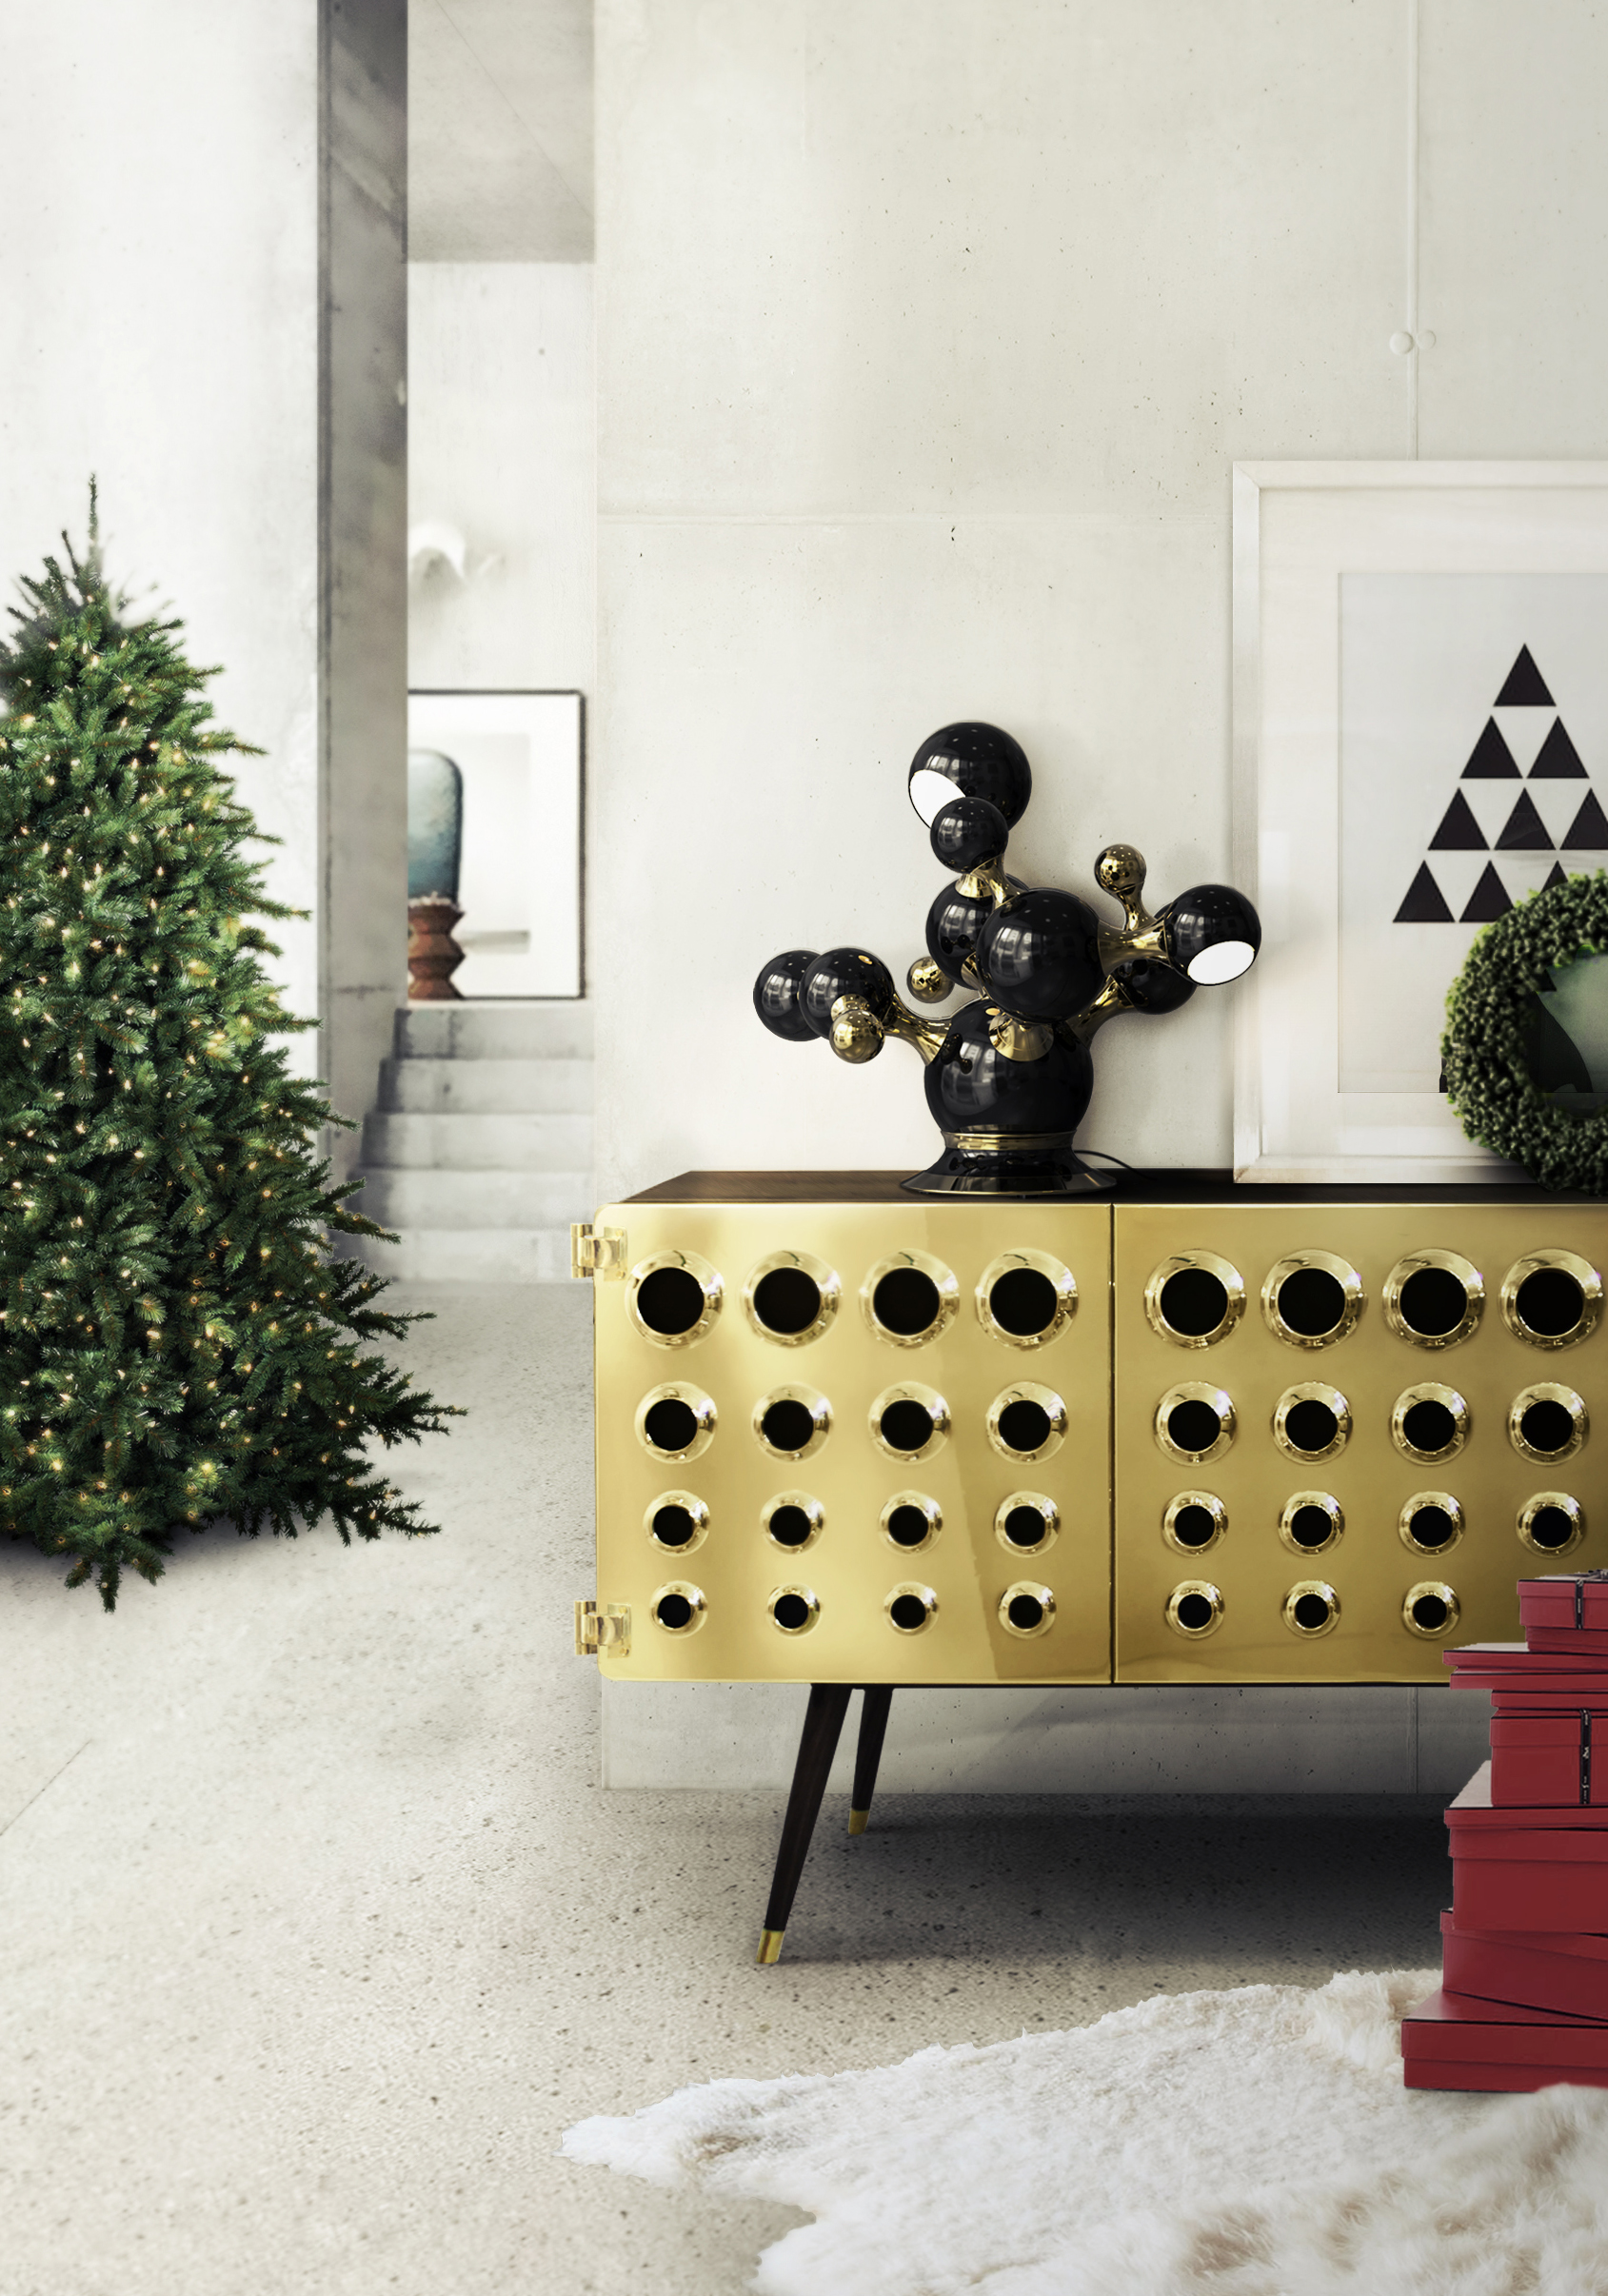 Top 7 Candeeiros Para Obter A Melhor Iluminação De Natal Em Sua Casa 2 iluminação de Natal